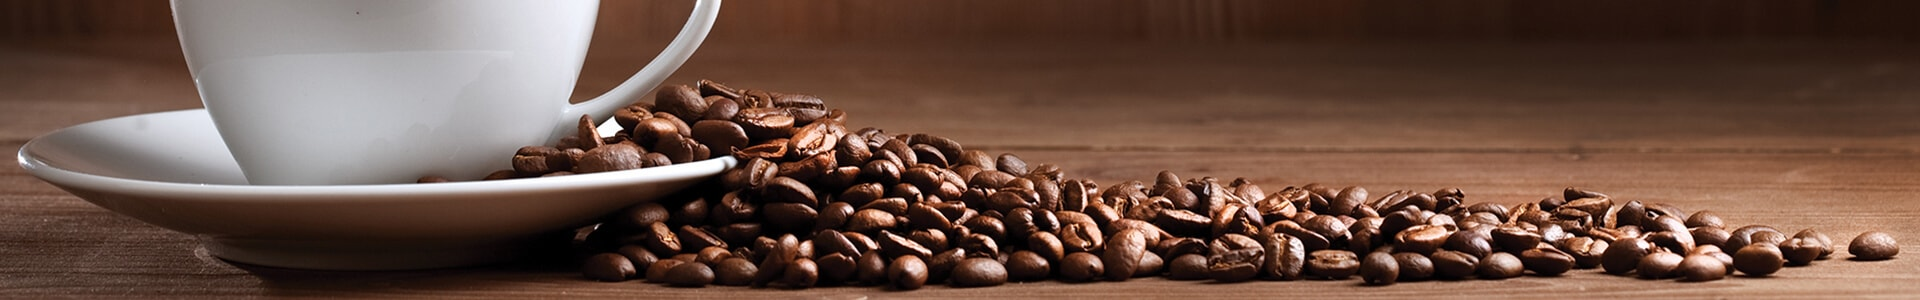 coffee header eviadelivery χαλκίδα - Eviadelivery.gr